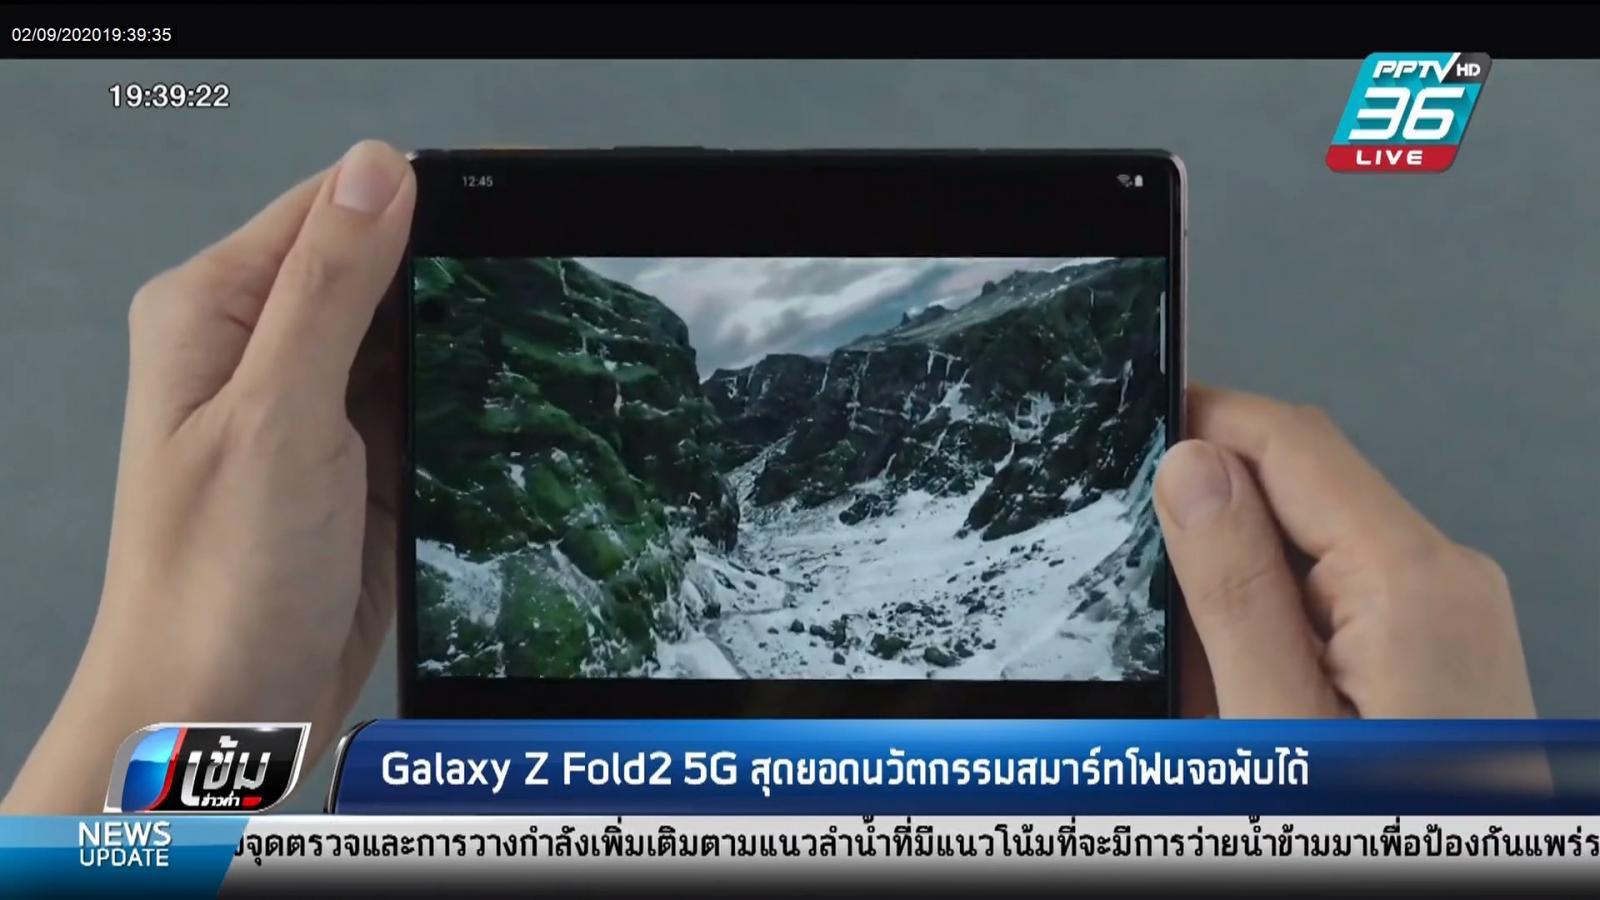 Galaxy Z Fold2 5G สุดยอดนวัตกรรมสมาร์ทโฟนจอพับได้